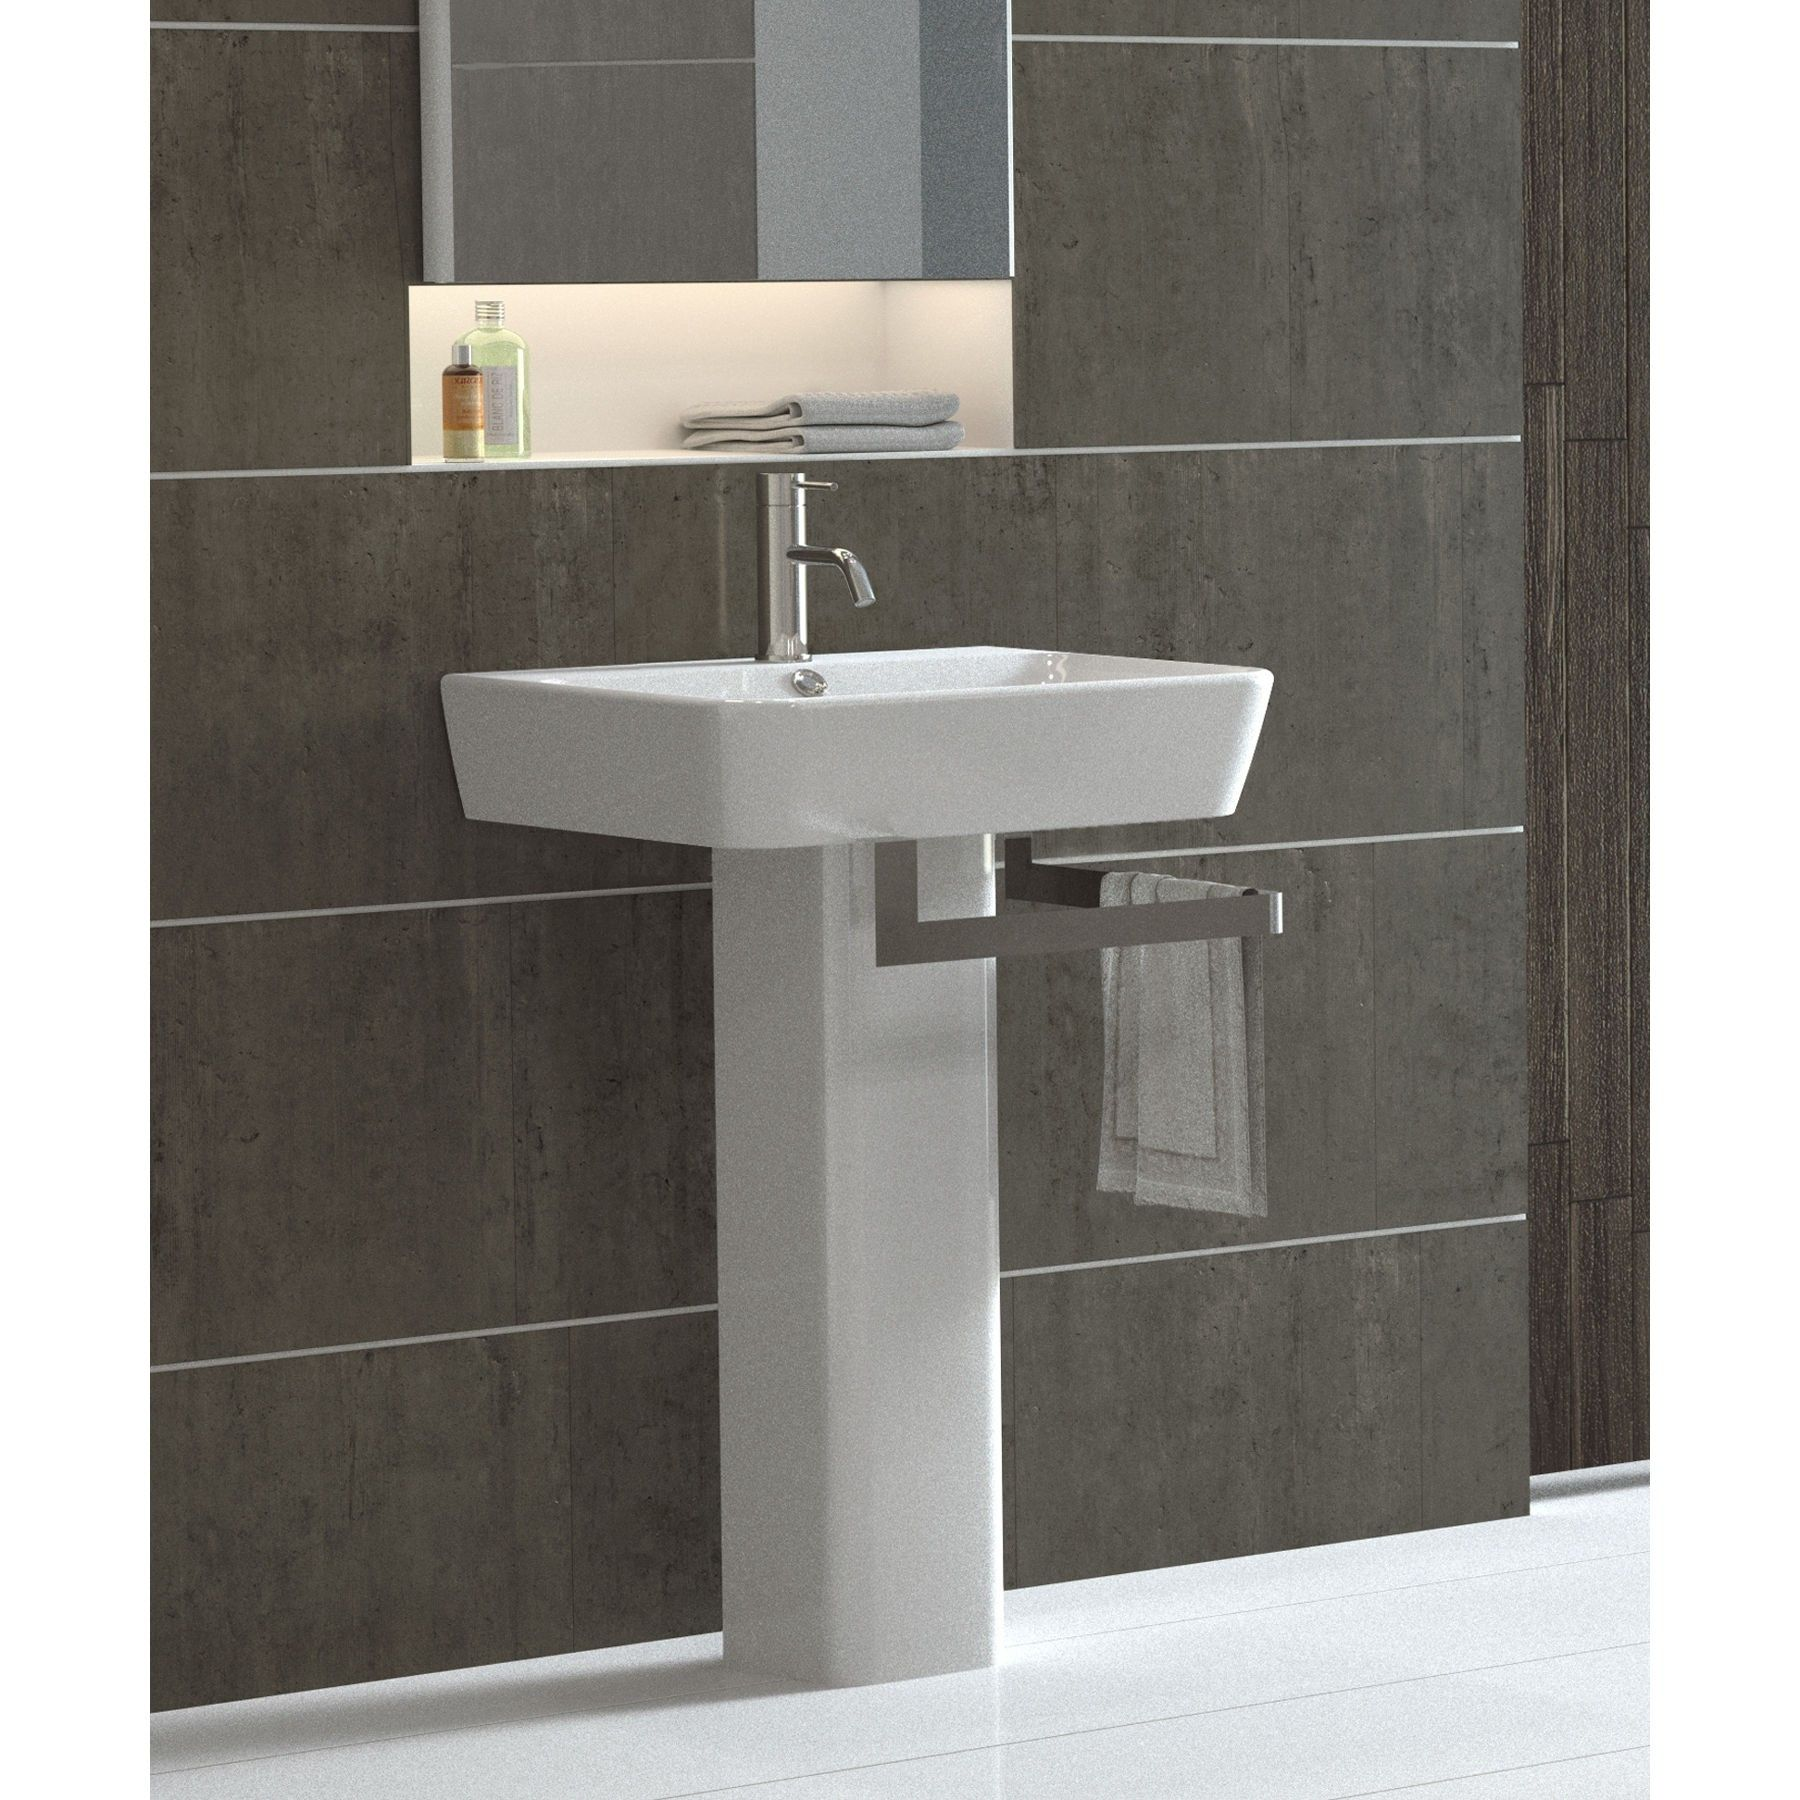 pedestal sink or vanity in small bathroom%0A Bissonnet Emma        Full Pedestal Overflow Bathroom Sink With